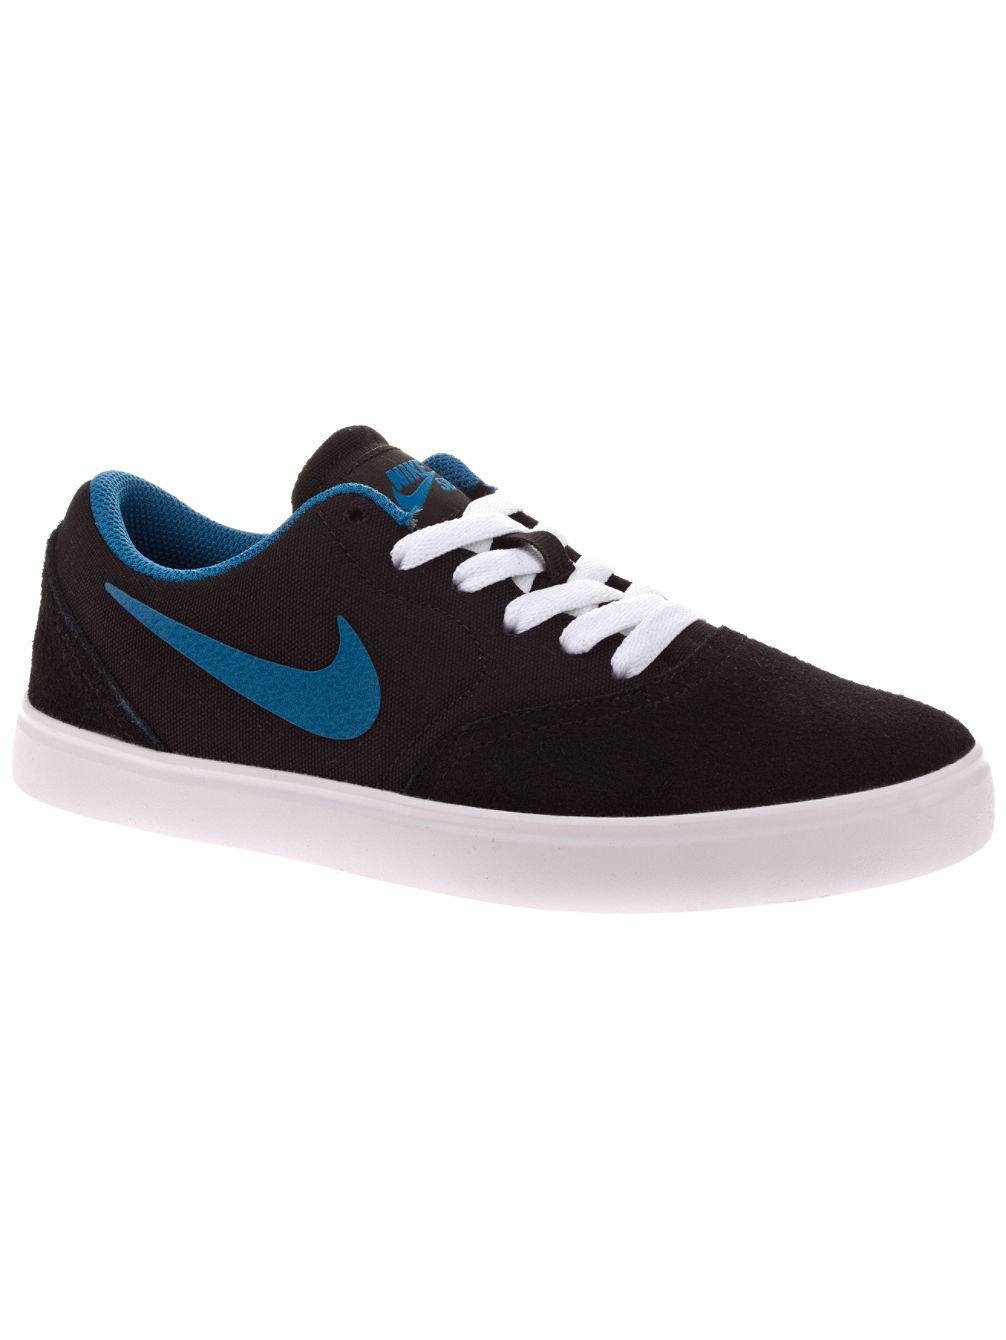 Nike SB Check (GS) Skate Shoes Boys - nike - blue-tomato.com